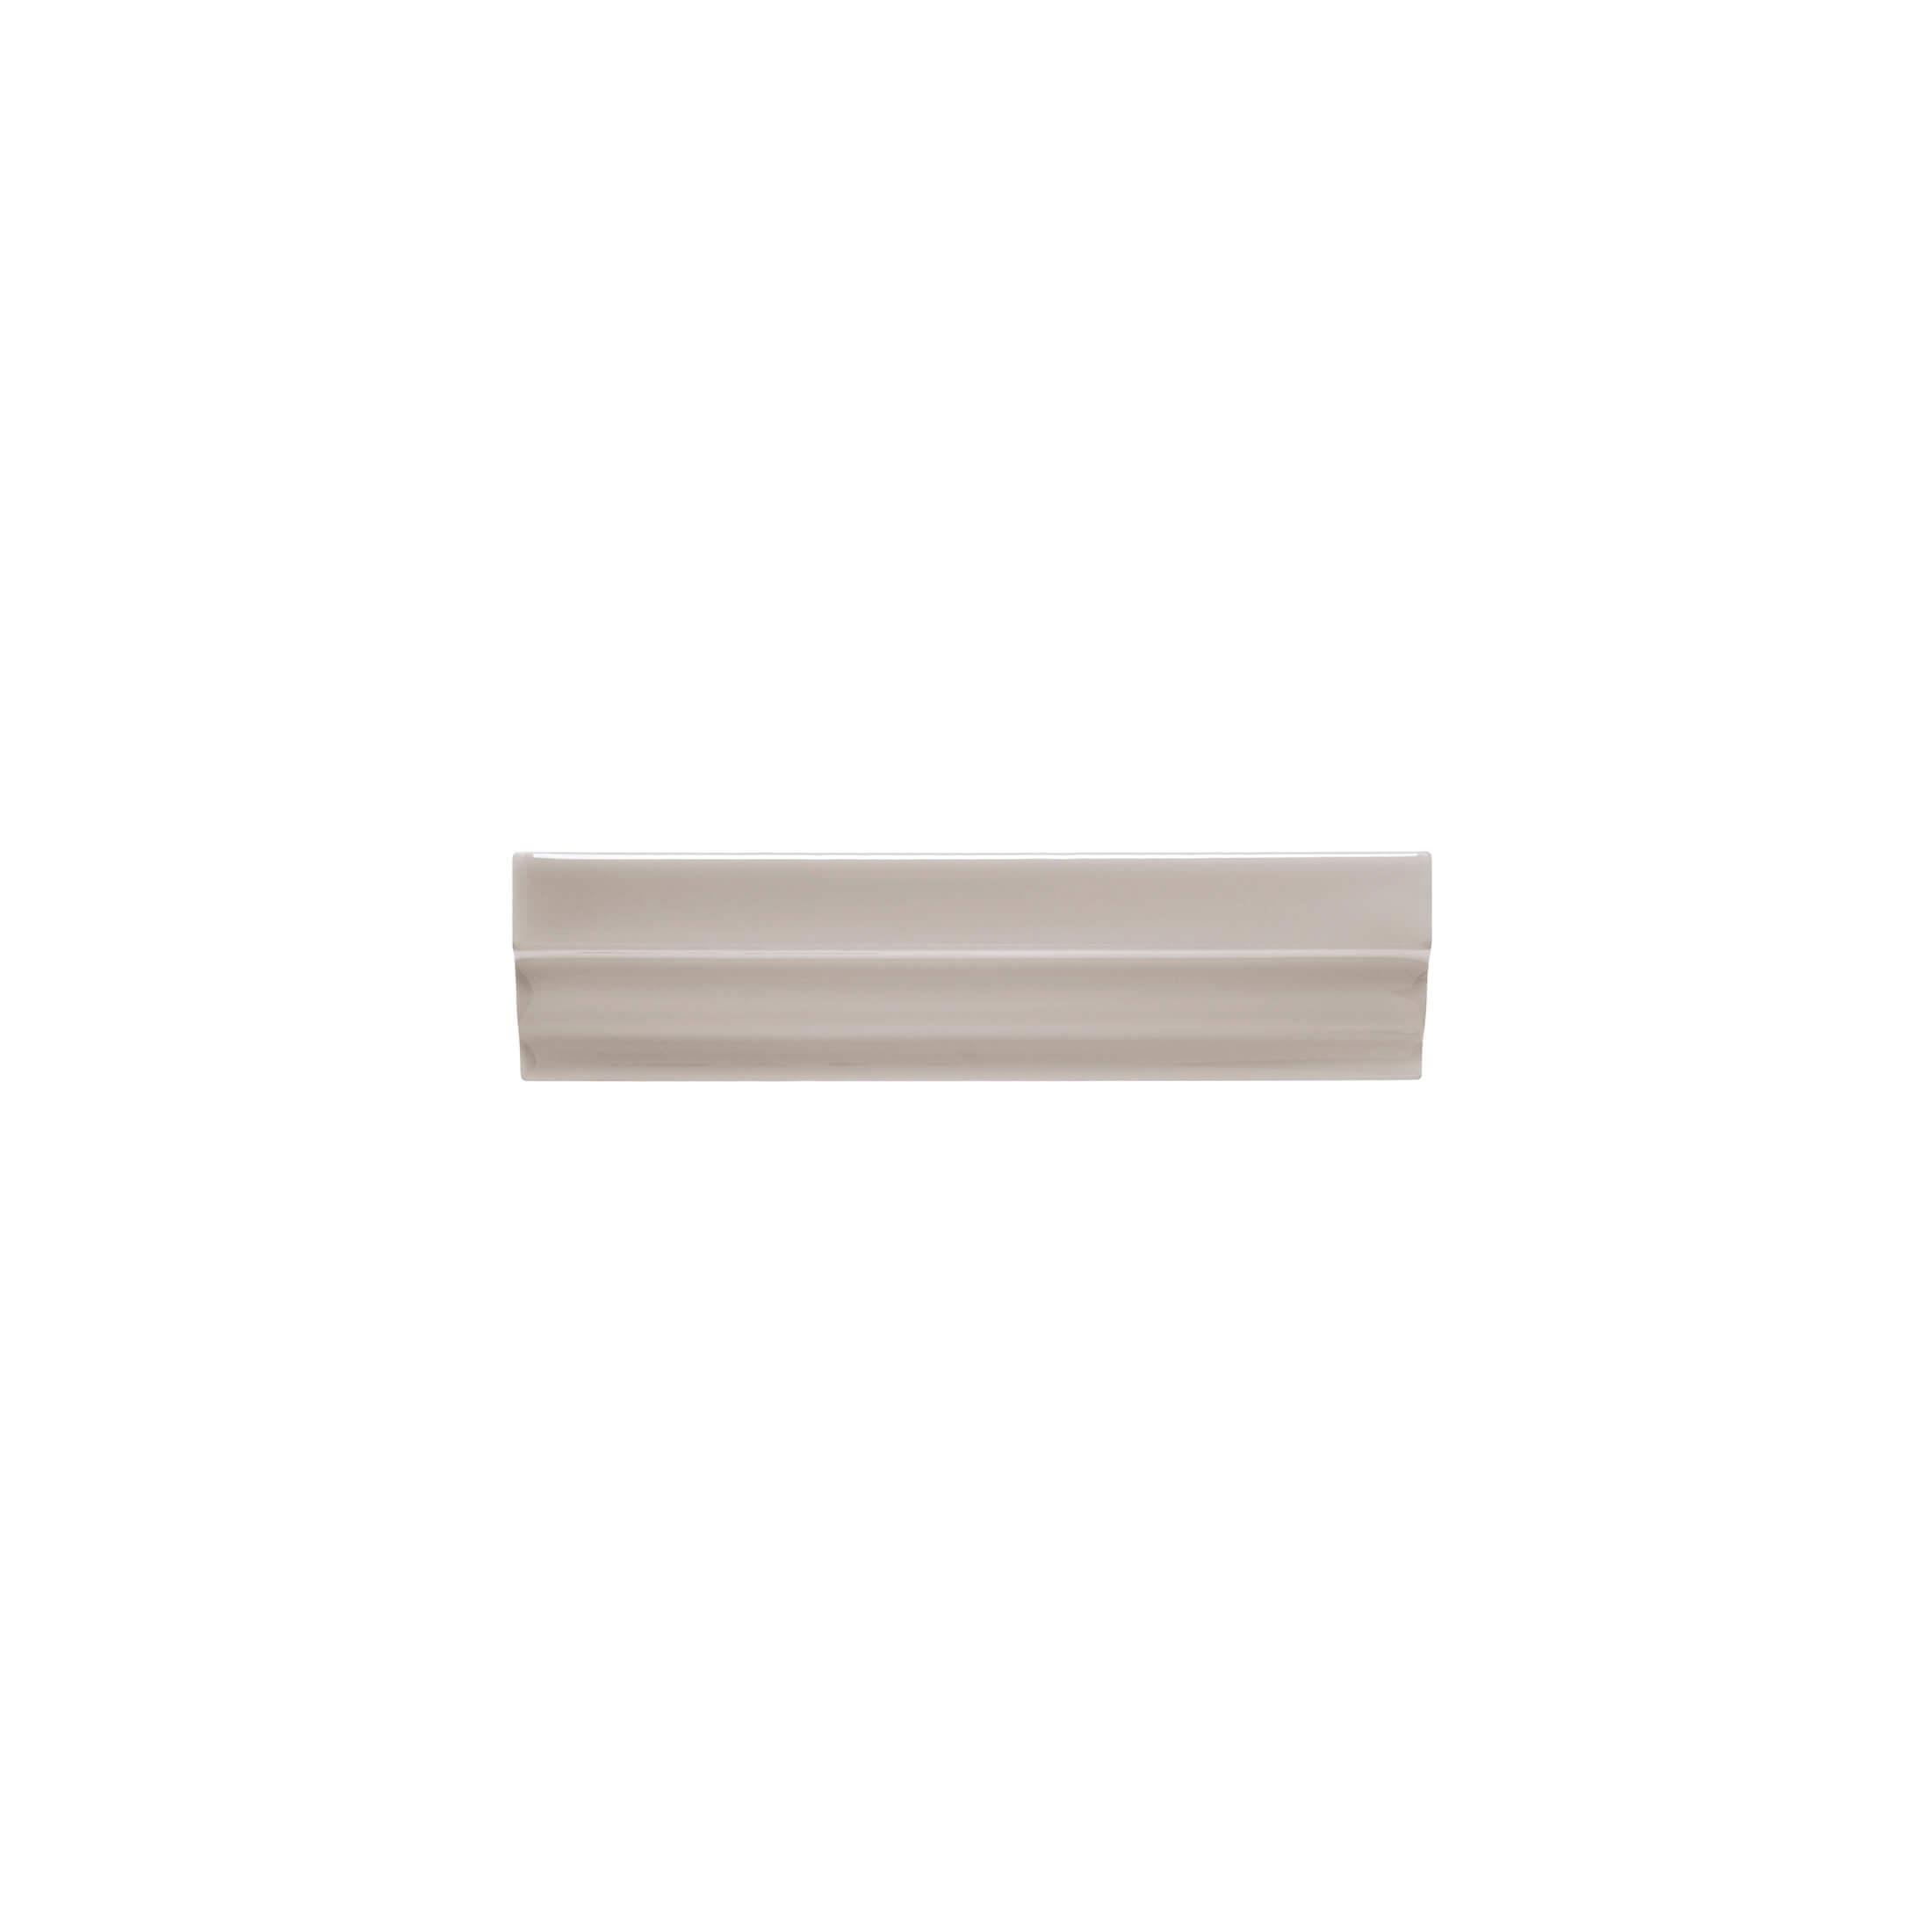 ADNE5503 - CORNISA CLASICA - 3,5 cm X 15 cm